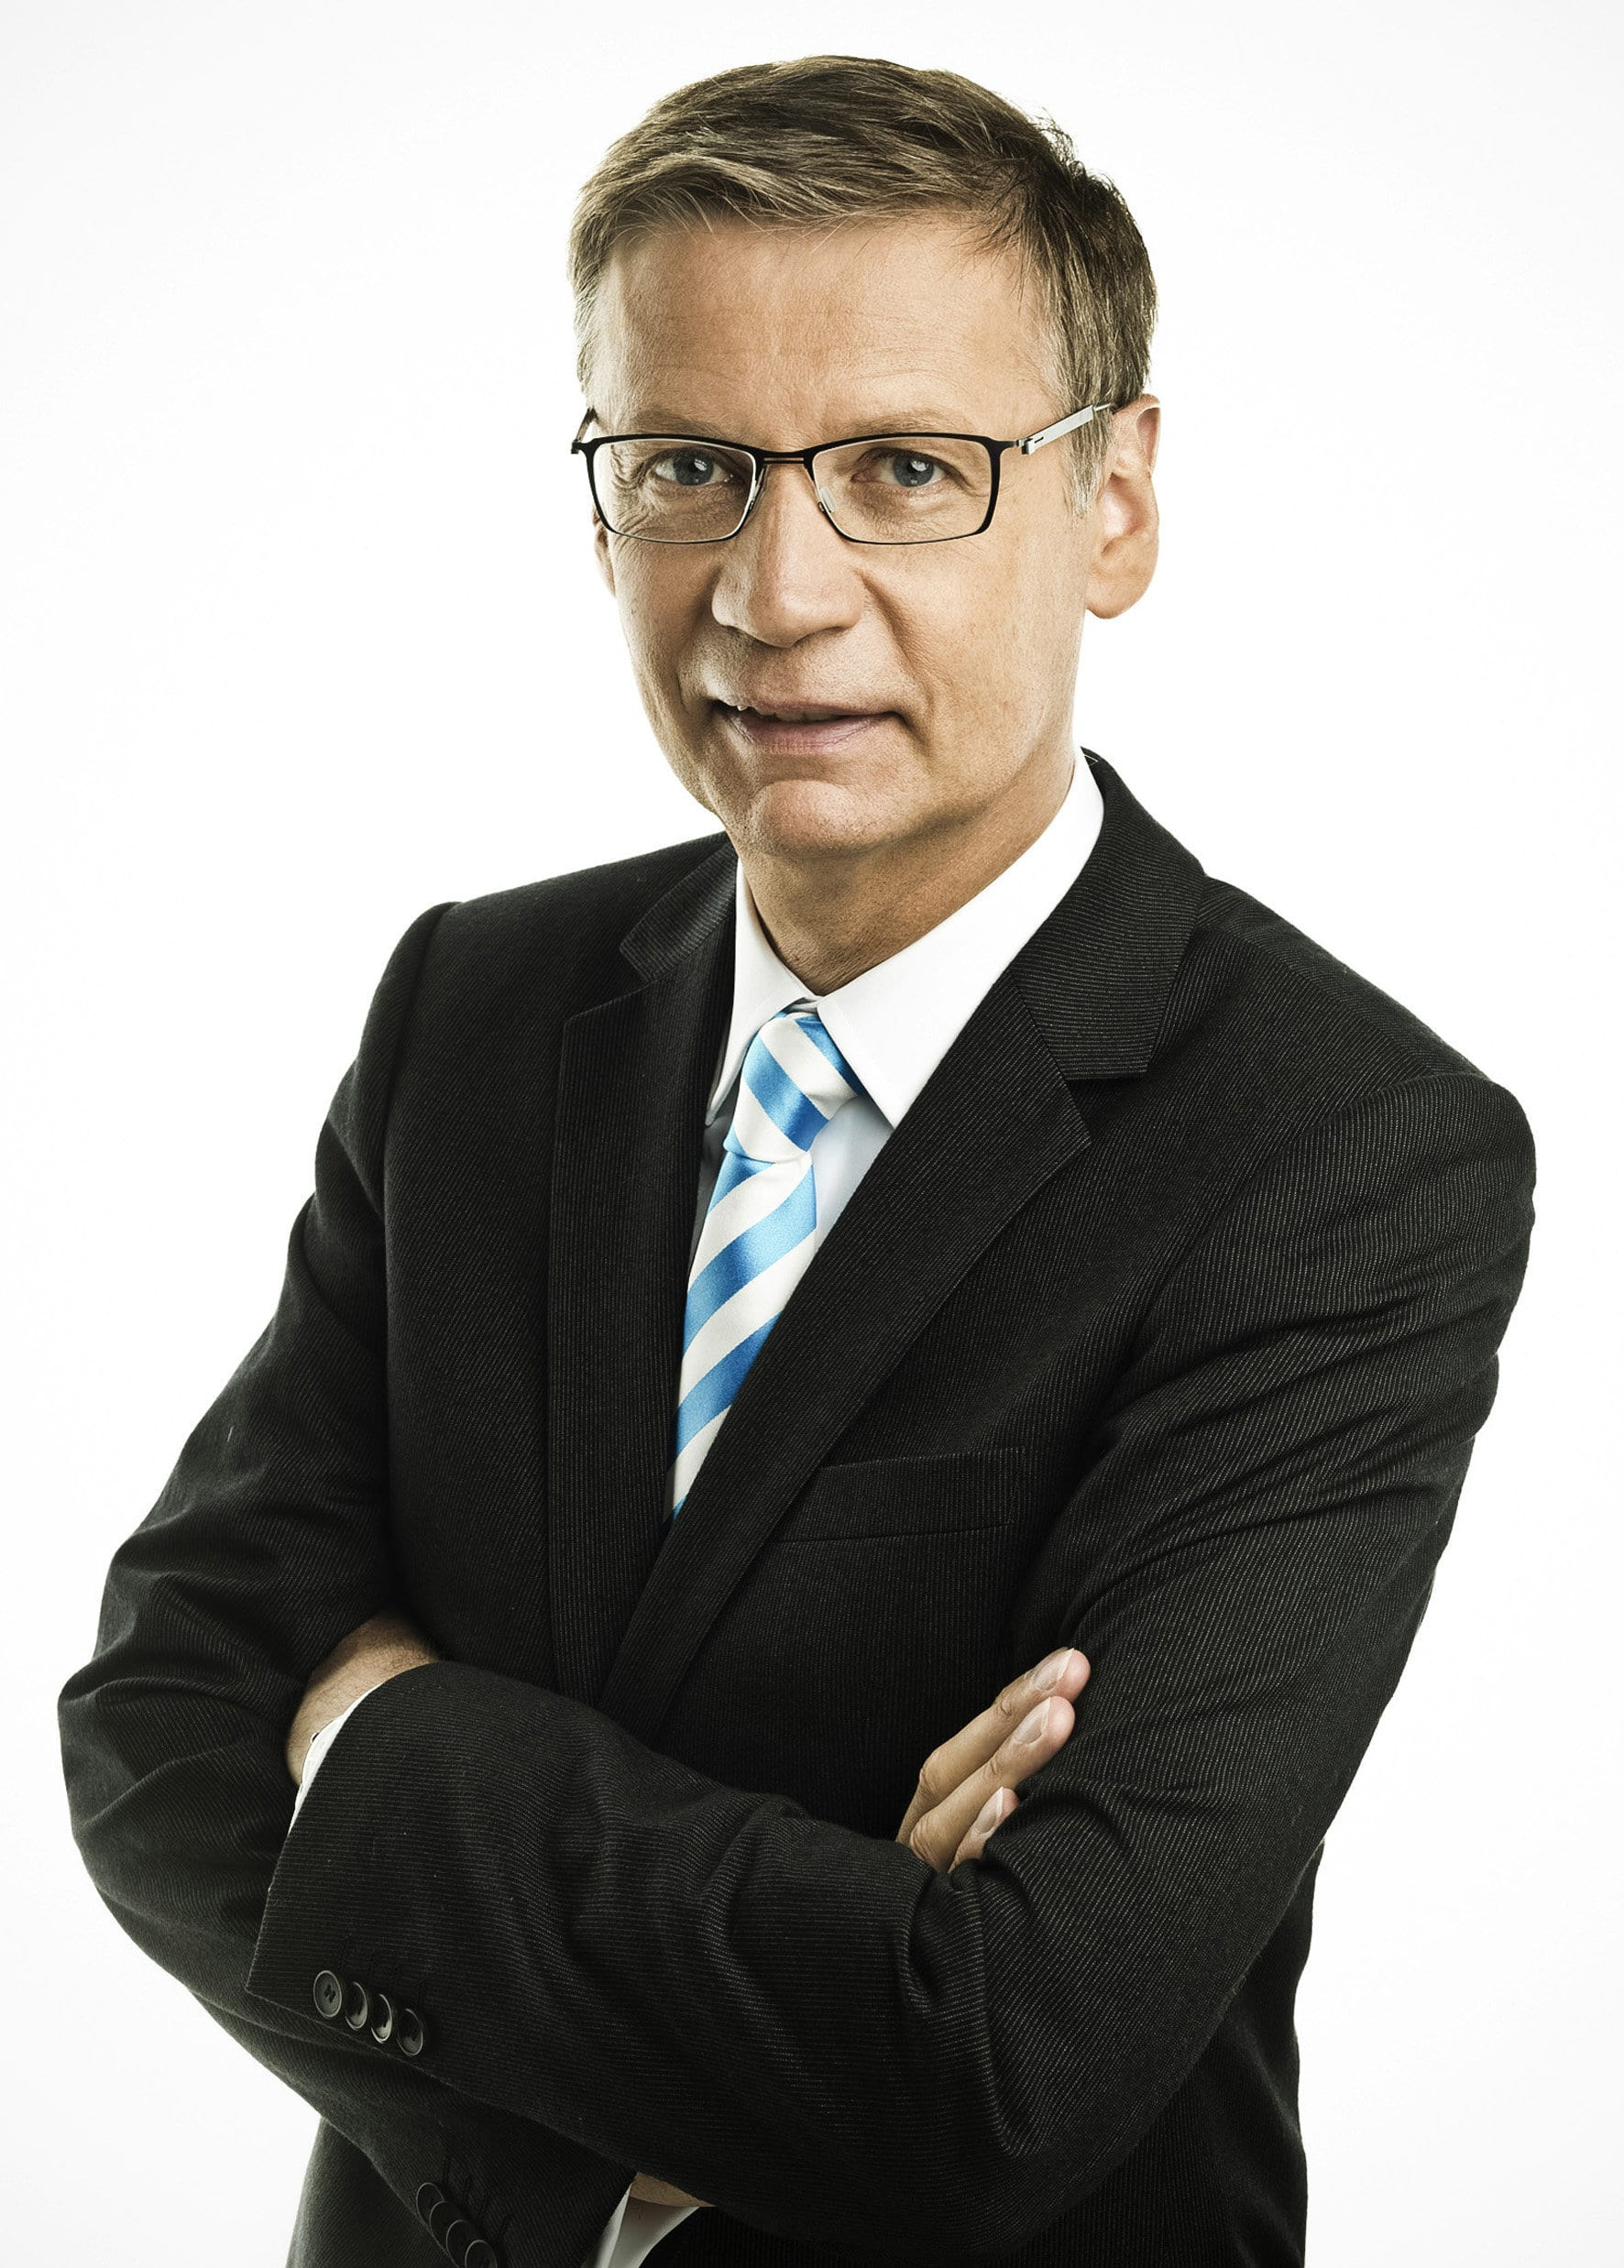 Thema Günther Jauch